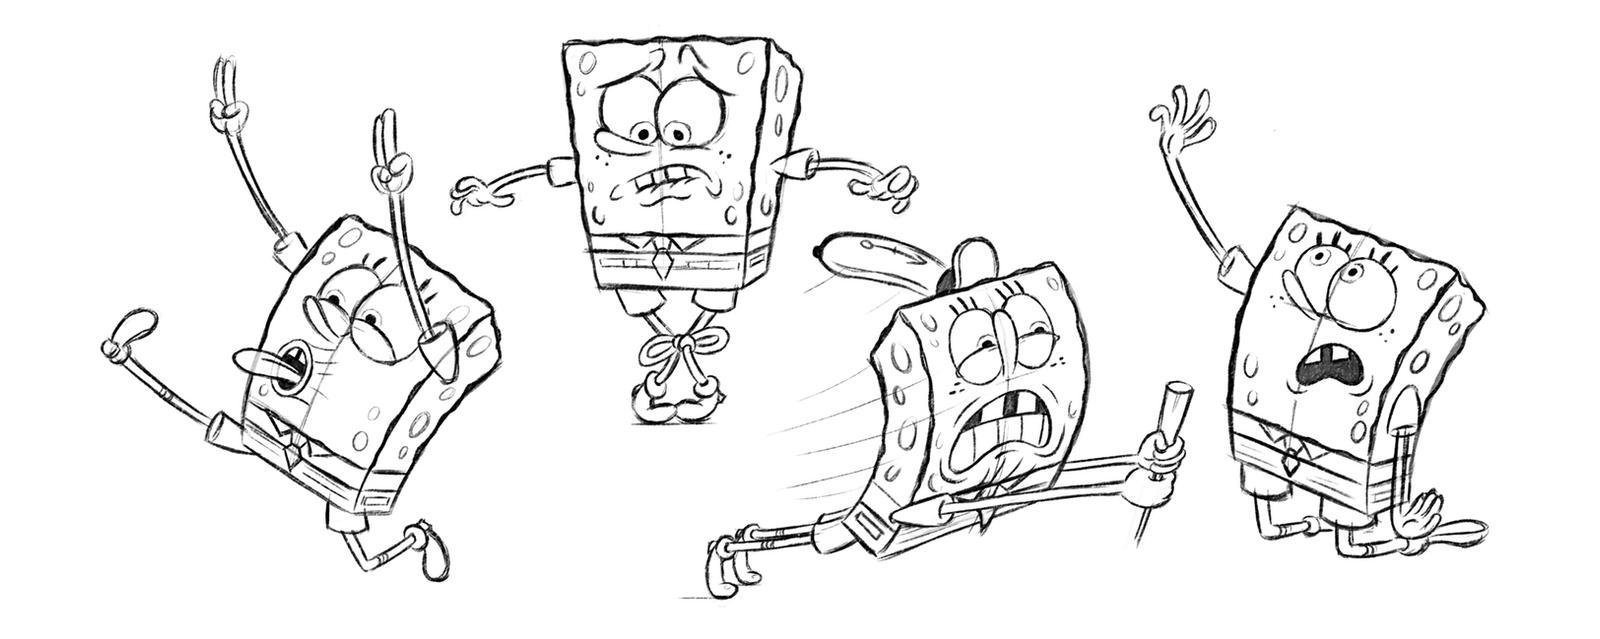 Spongebobs more sketches!!